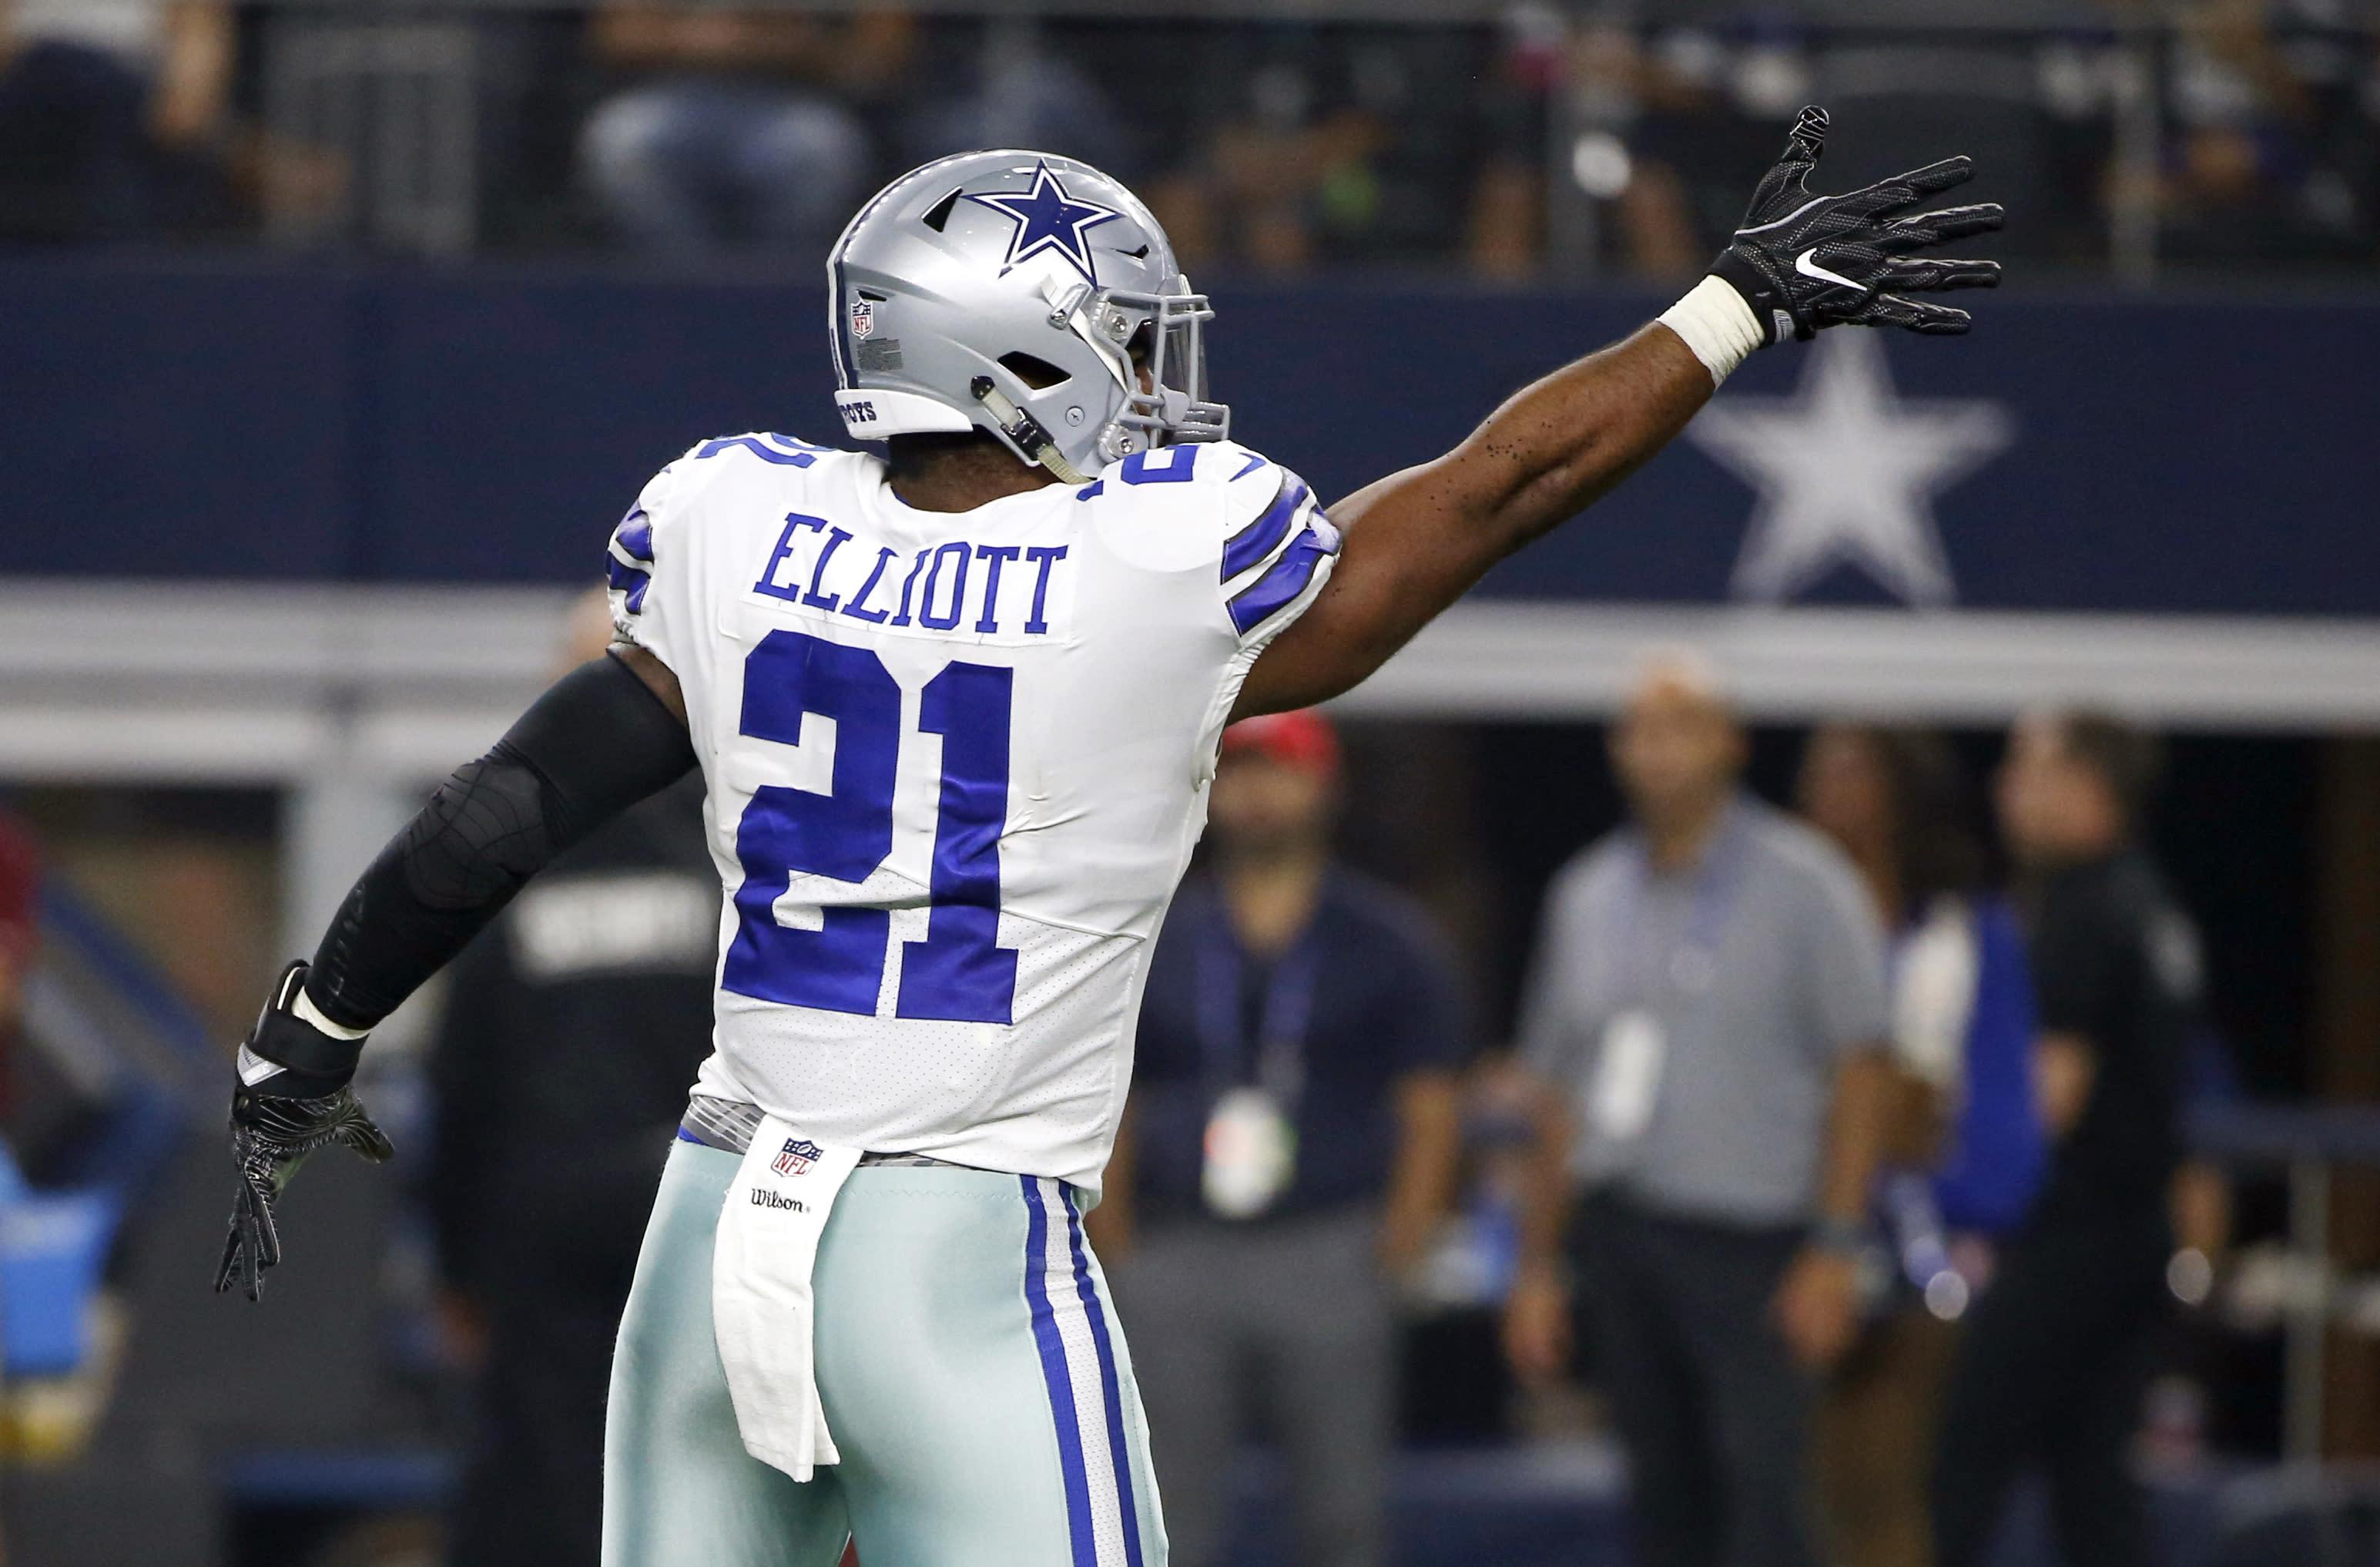 NFL did harm to accuser and accused in Ezekiel Elliott case